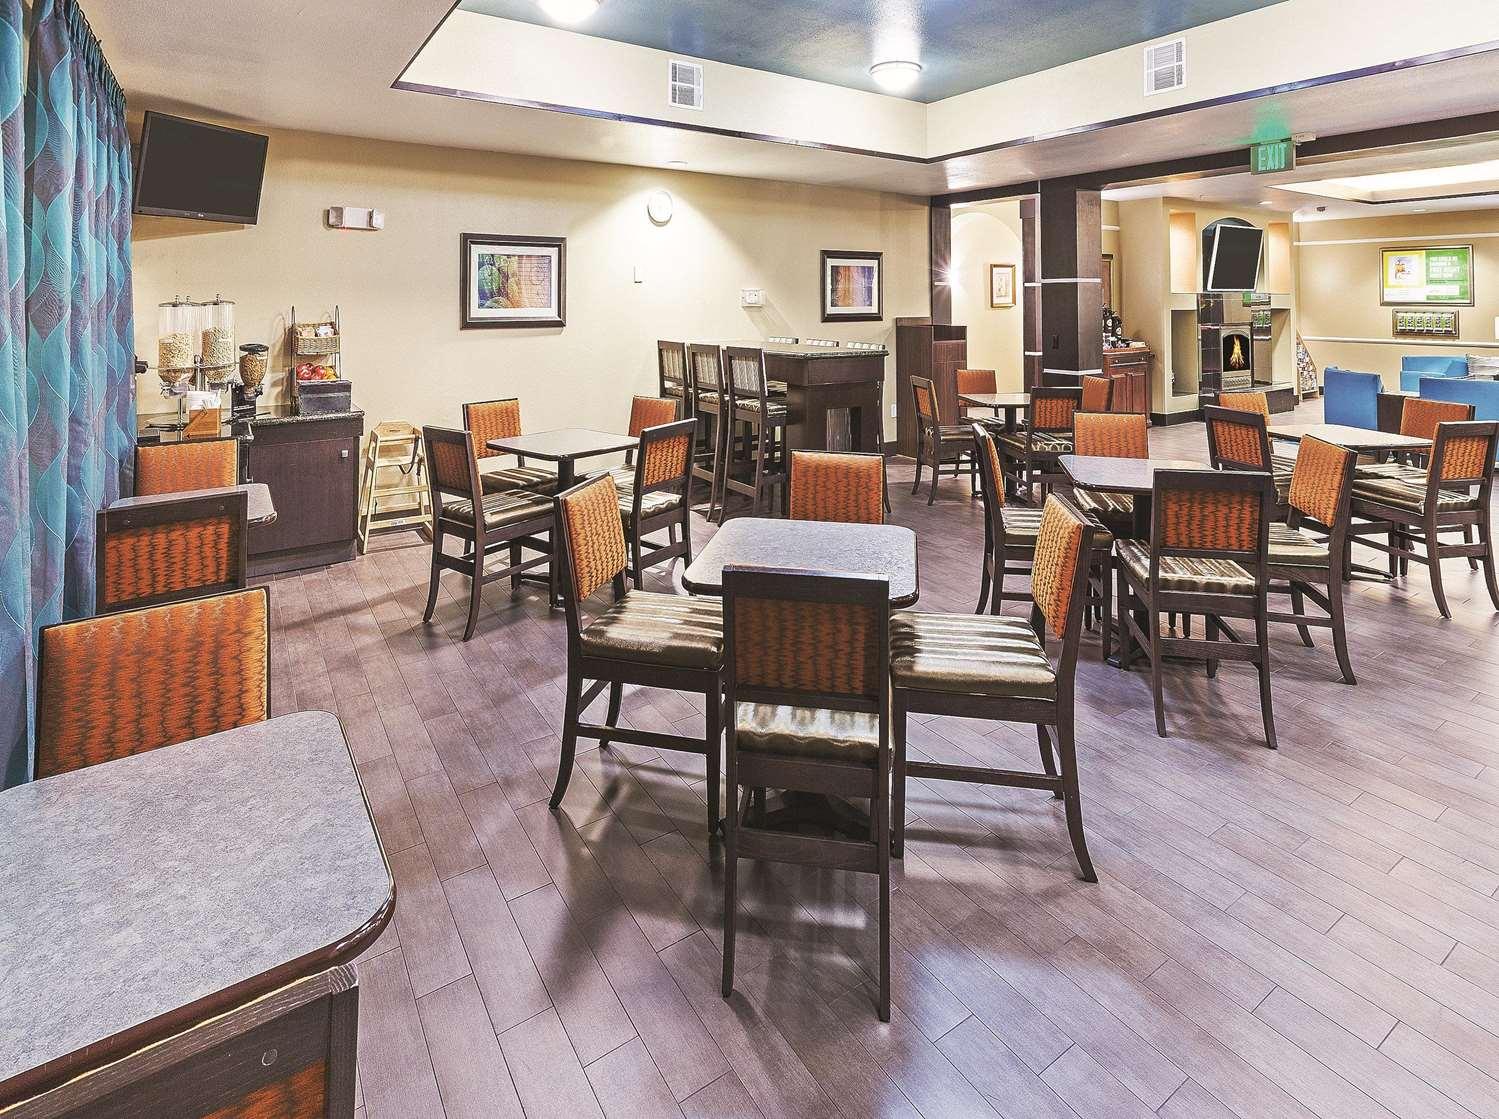 proam - La Quinta Inn Hobby Airport Houston